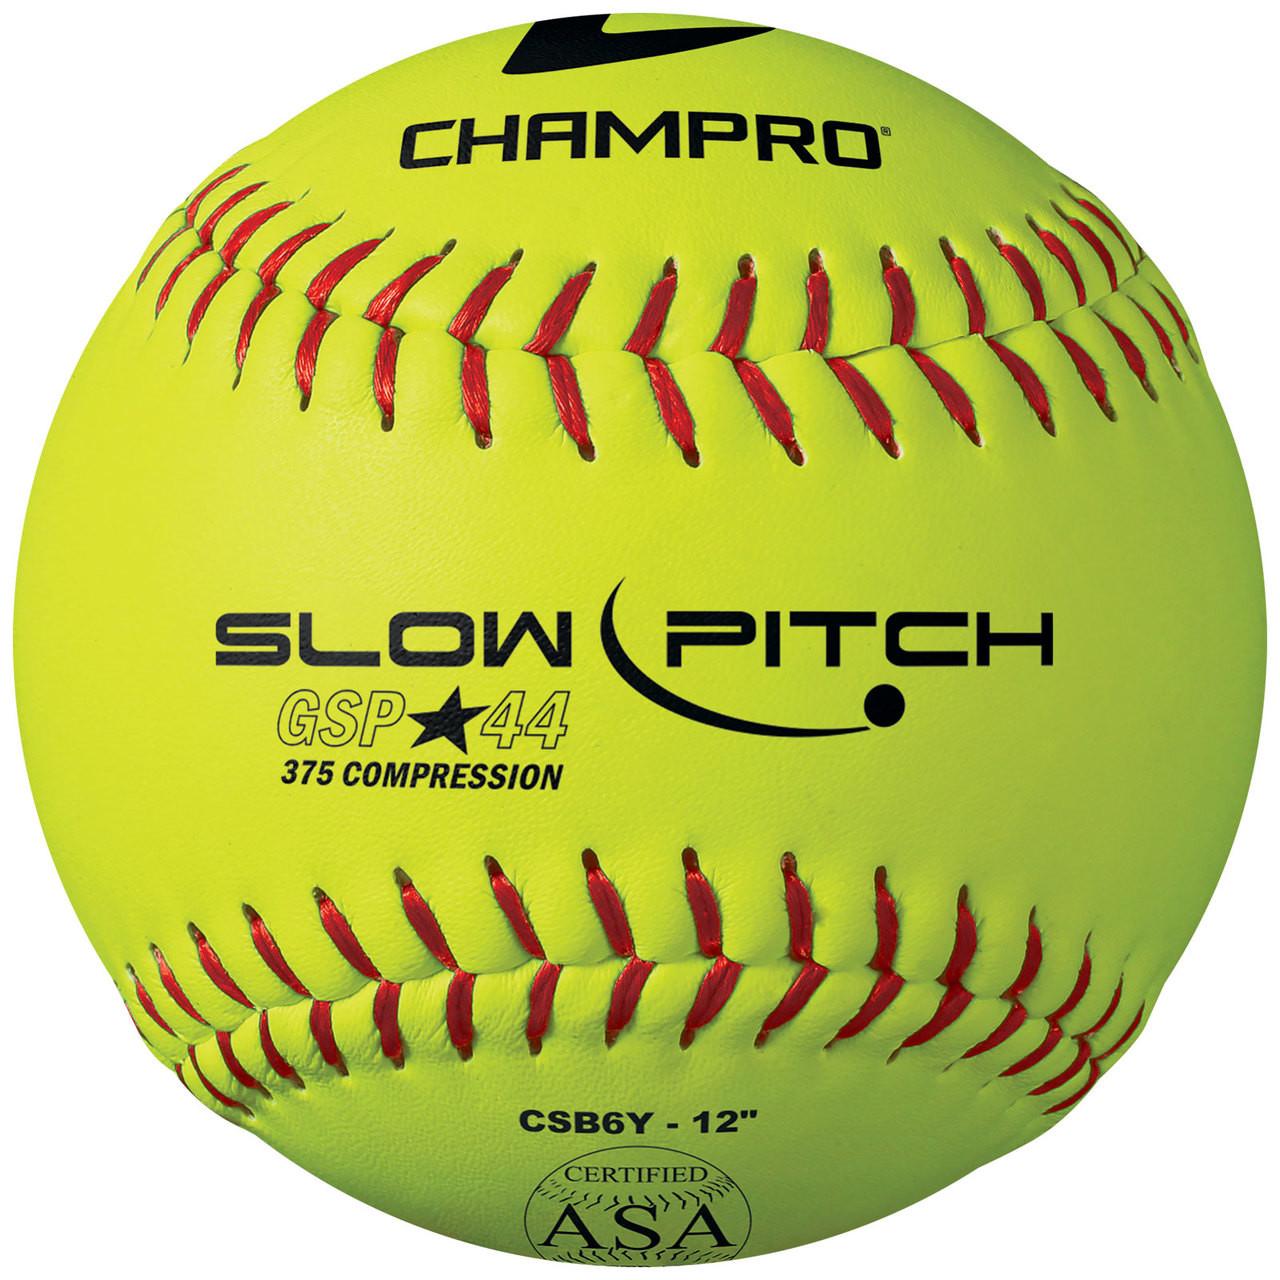 "Champro ASA 12"" Slowpitch Softballs"